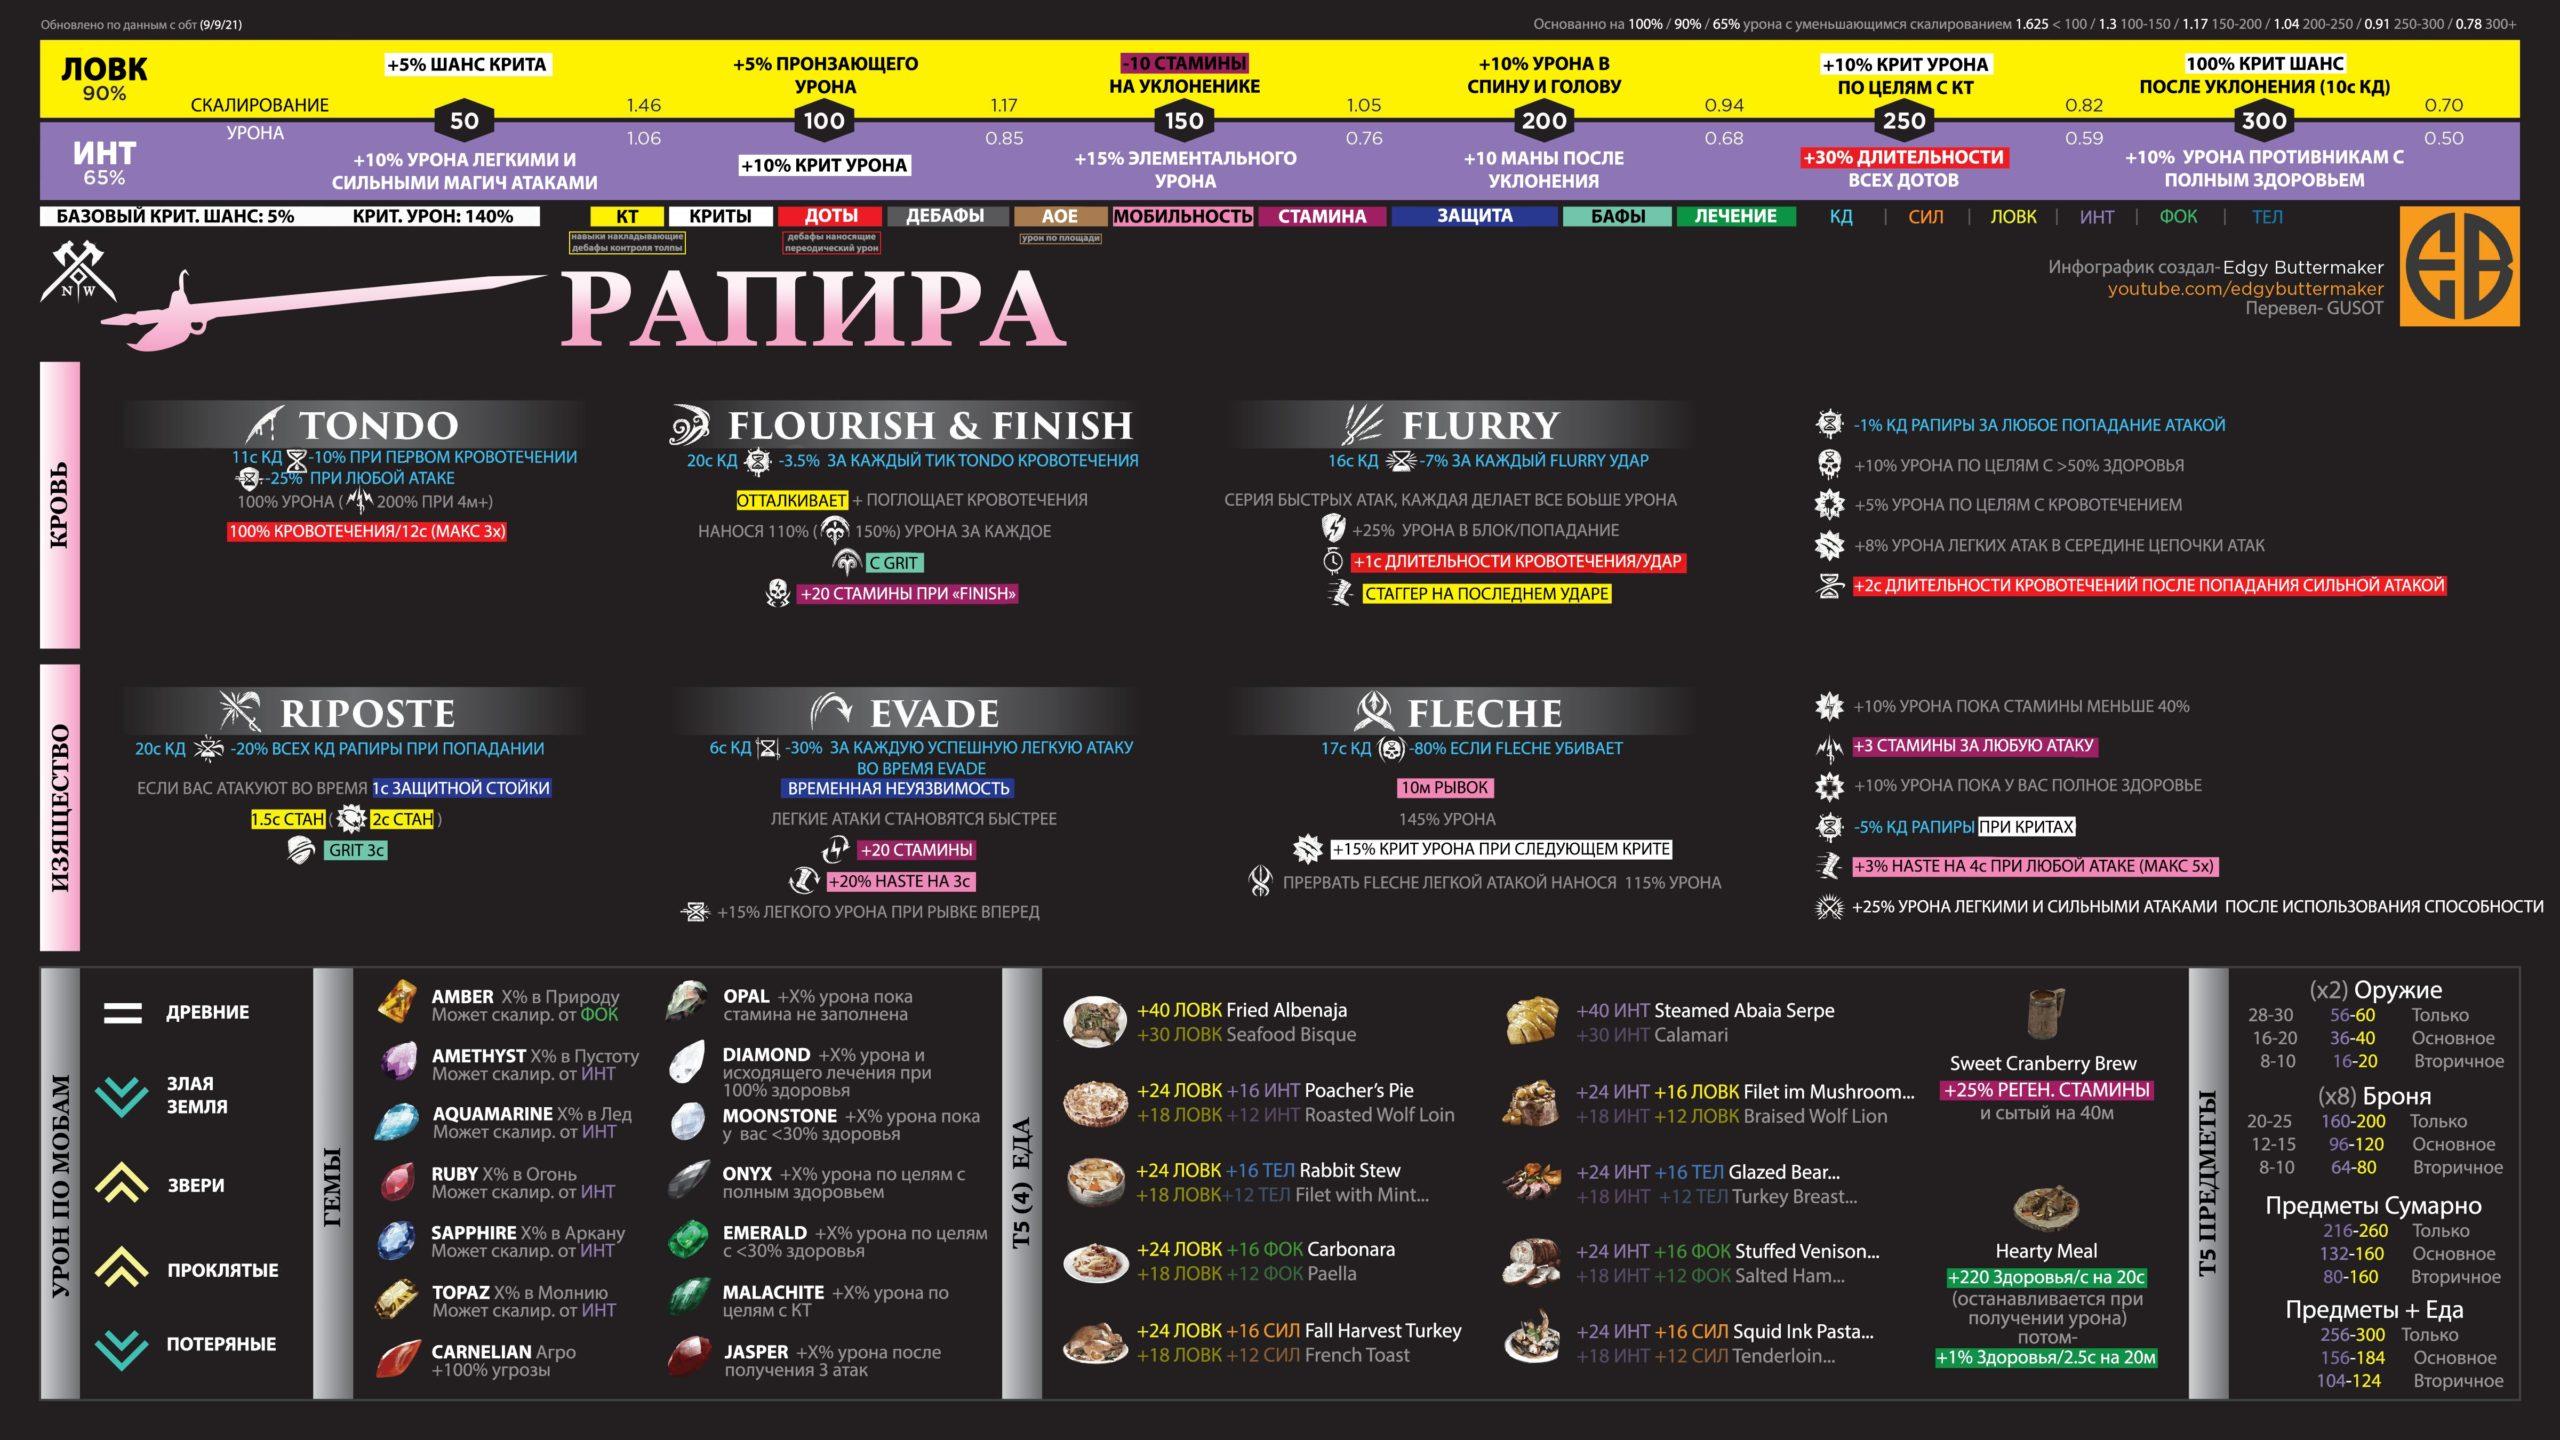 Rapier. Памятка на русском языке